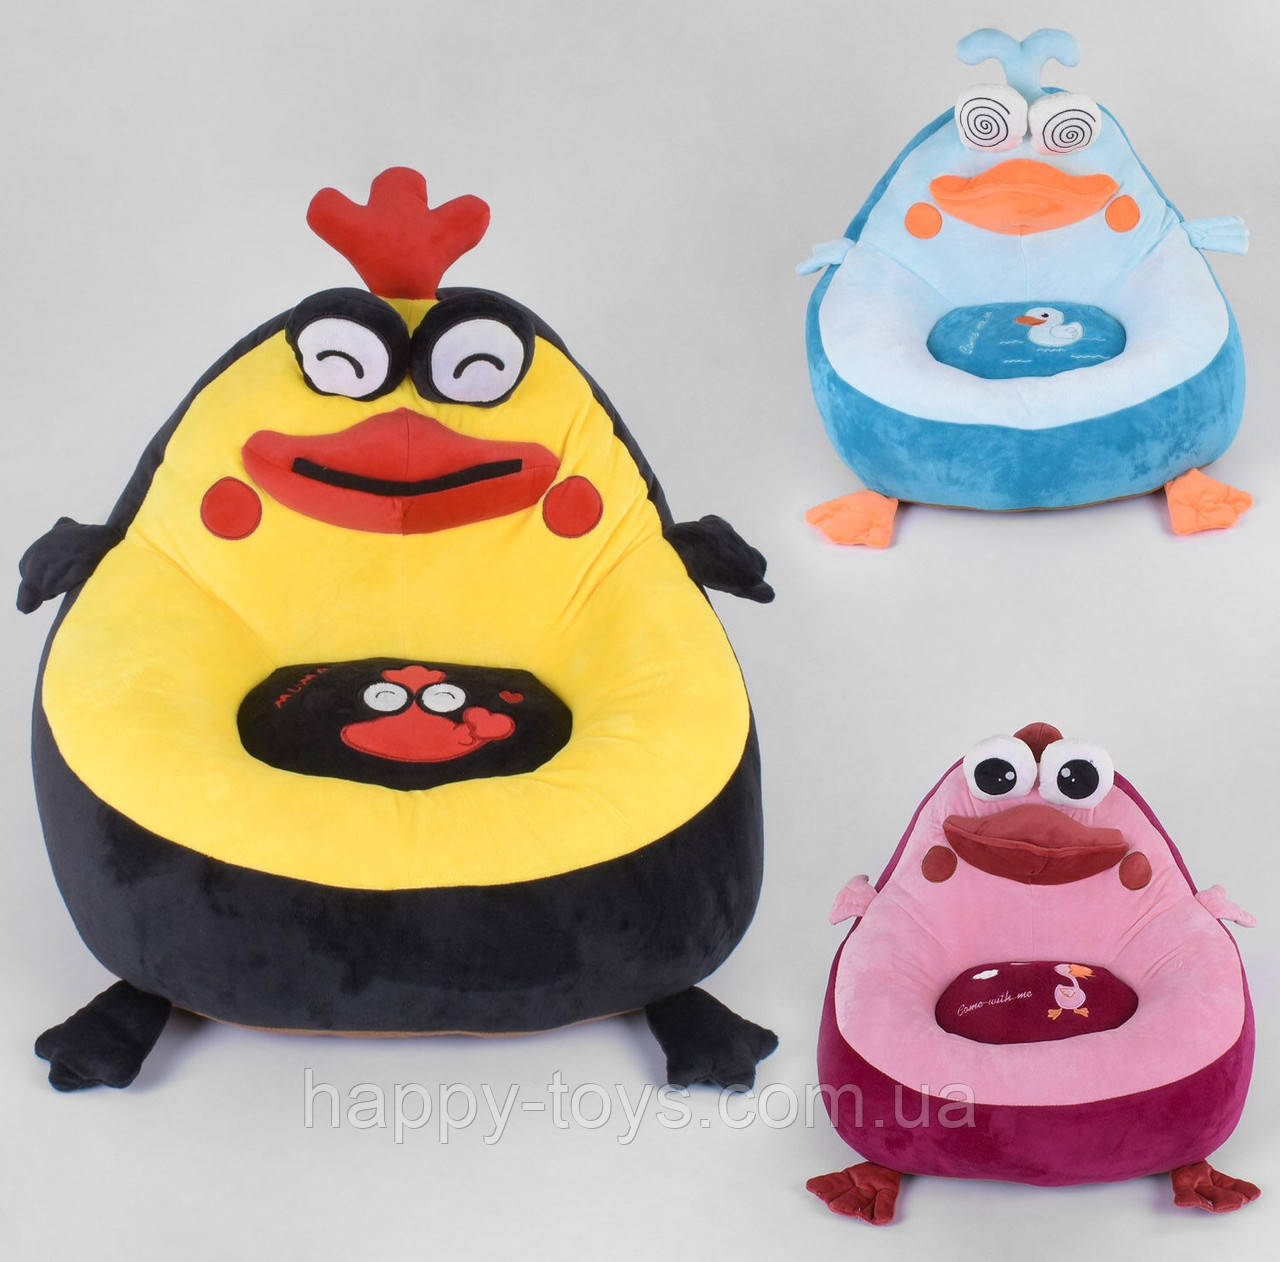 Кресло мягкое мягкое игрушка Птички 3 вида, 55х41х45 см C 44365